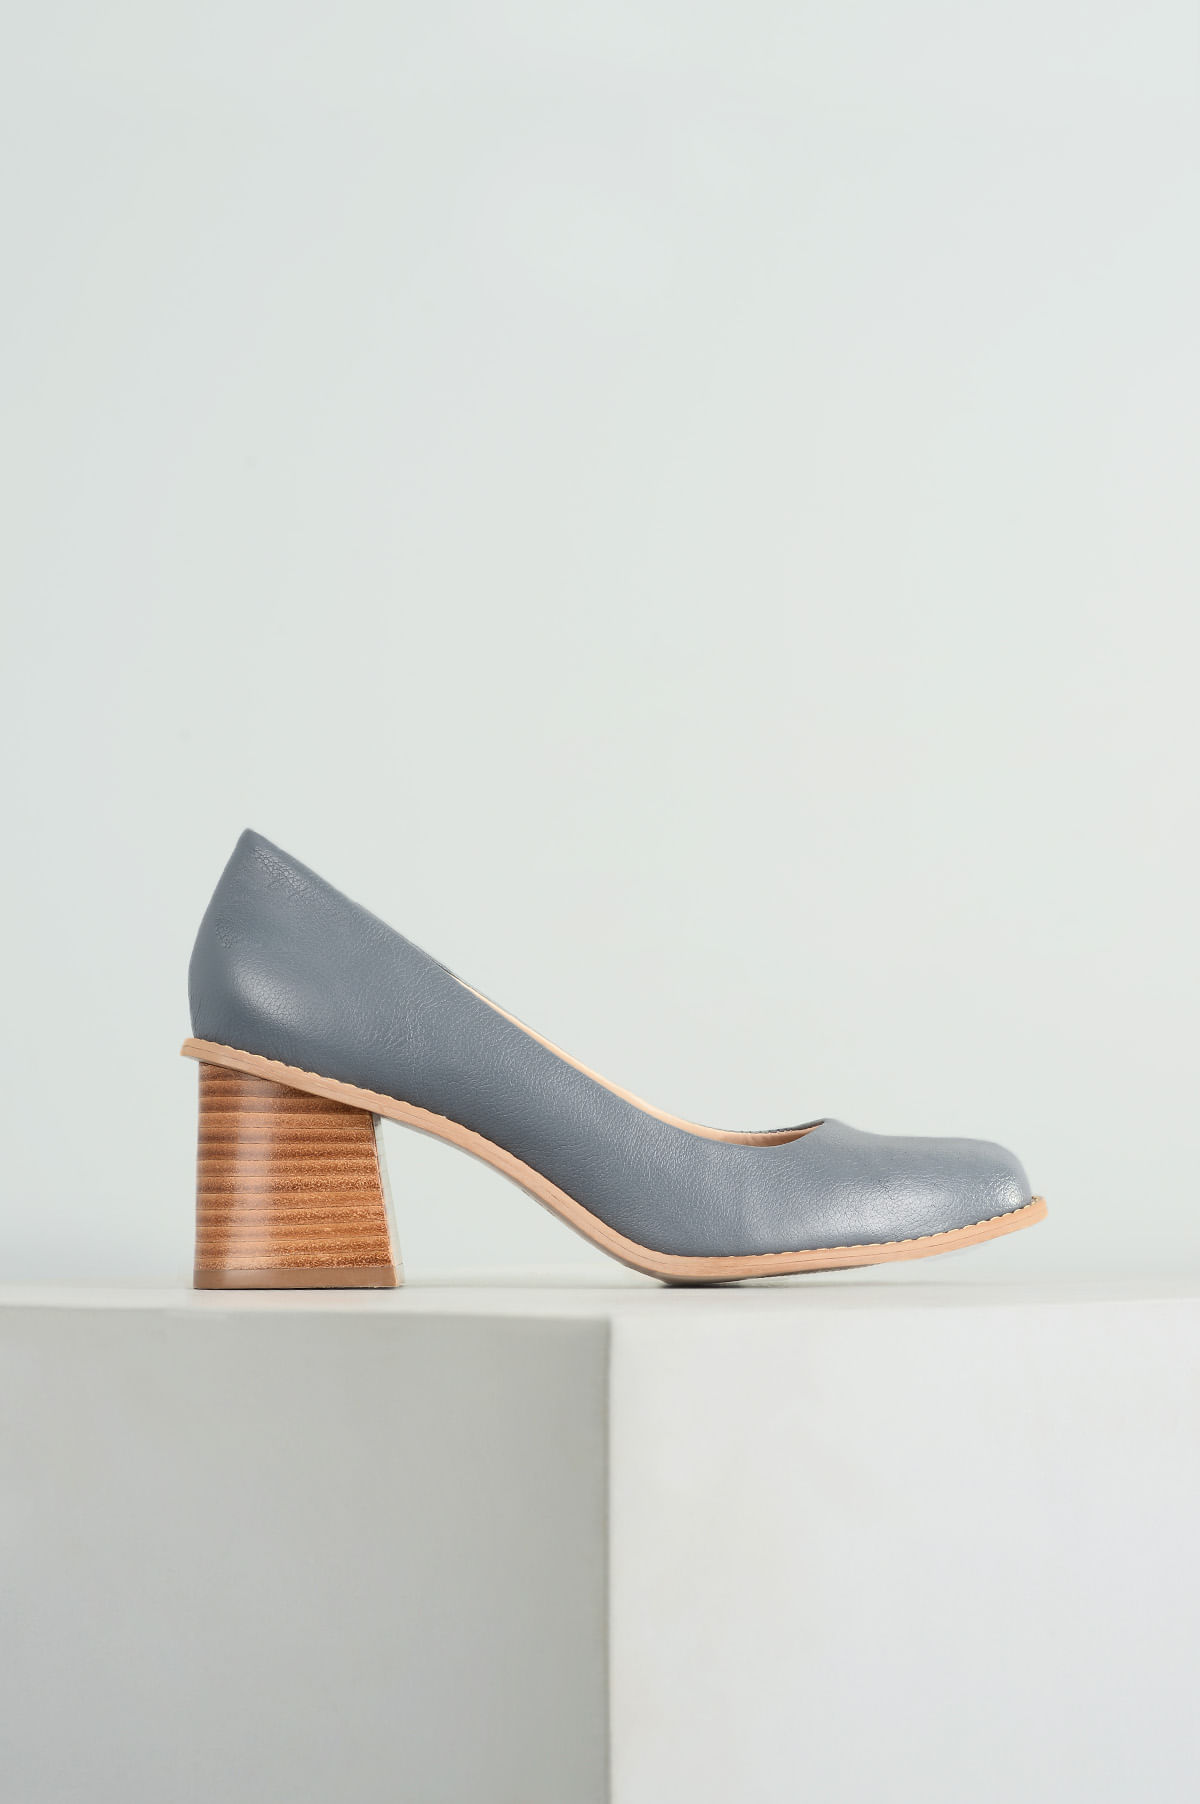 102a9dc04 Sapato Feminino Salto Médio Lorelay Mundial CR-AZUL - Mundial Calçados